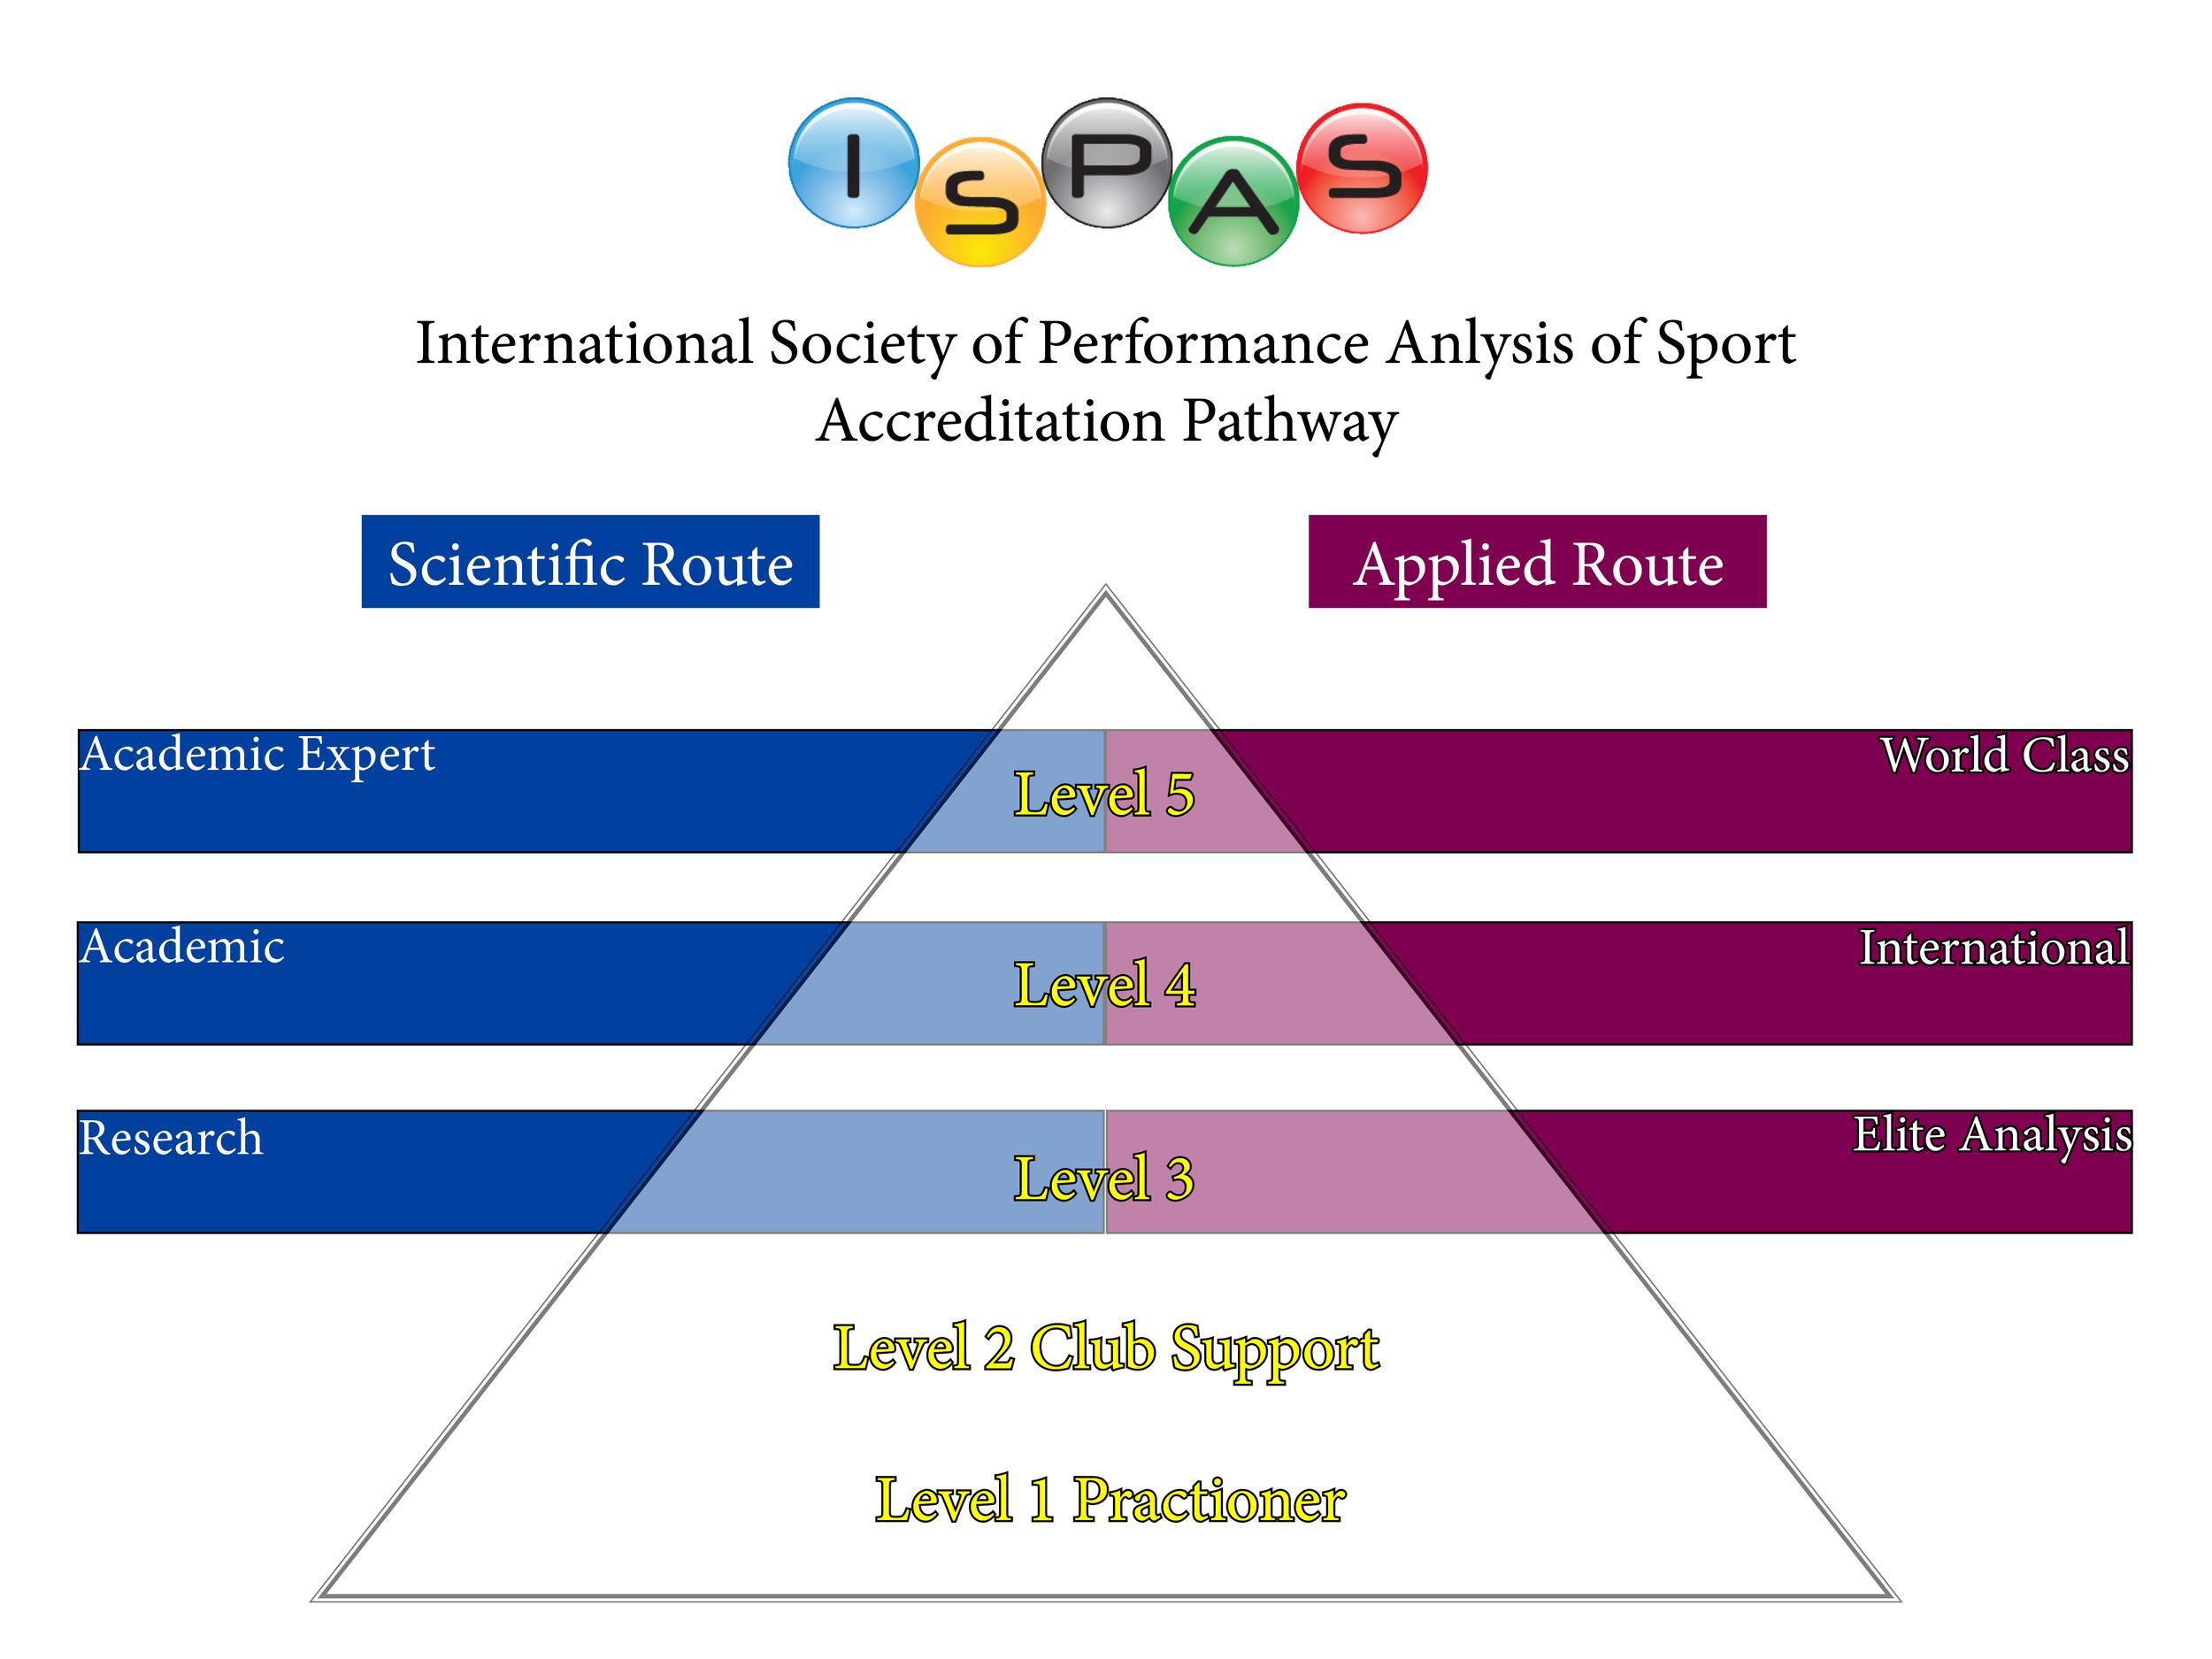 Source: ISPAS.org